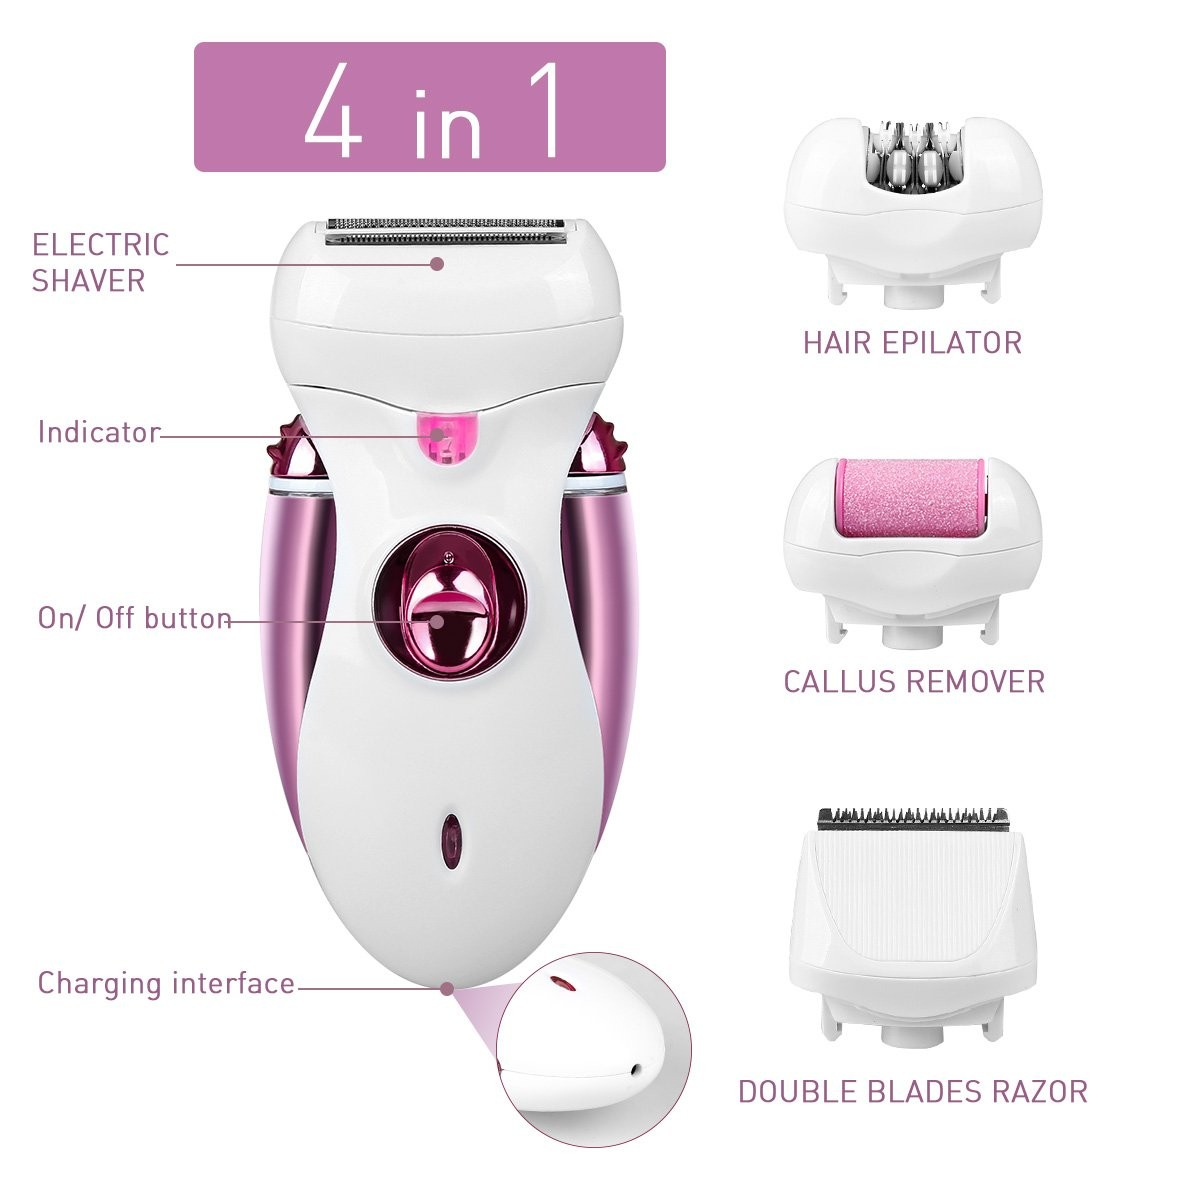 Hair Epilator, Buture Womens Epilator Cordless 4 IN 1 Electric Hair Remover Razor Shaver with Bikini